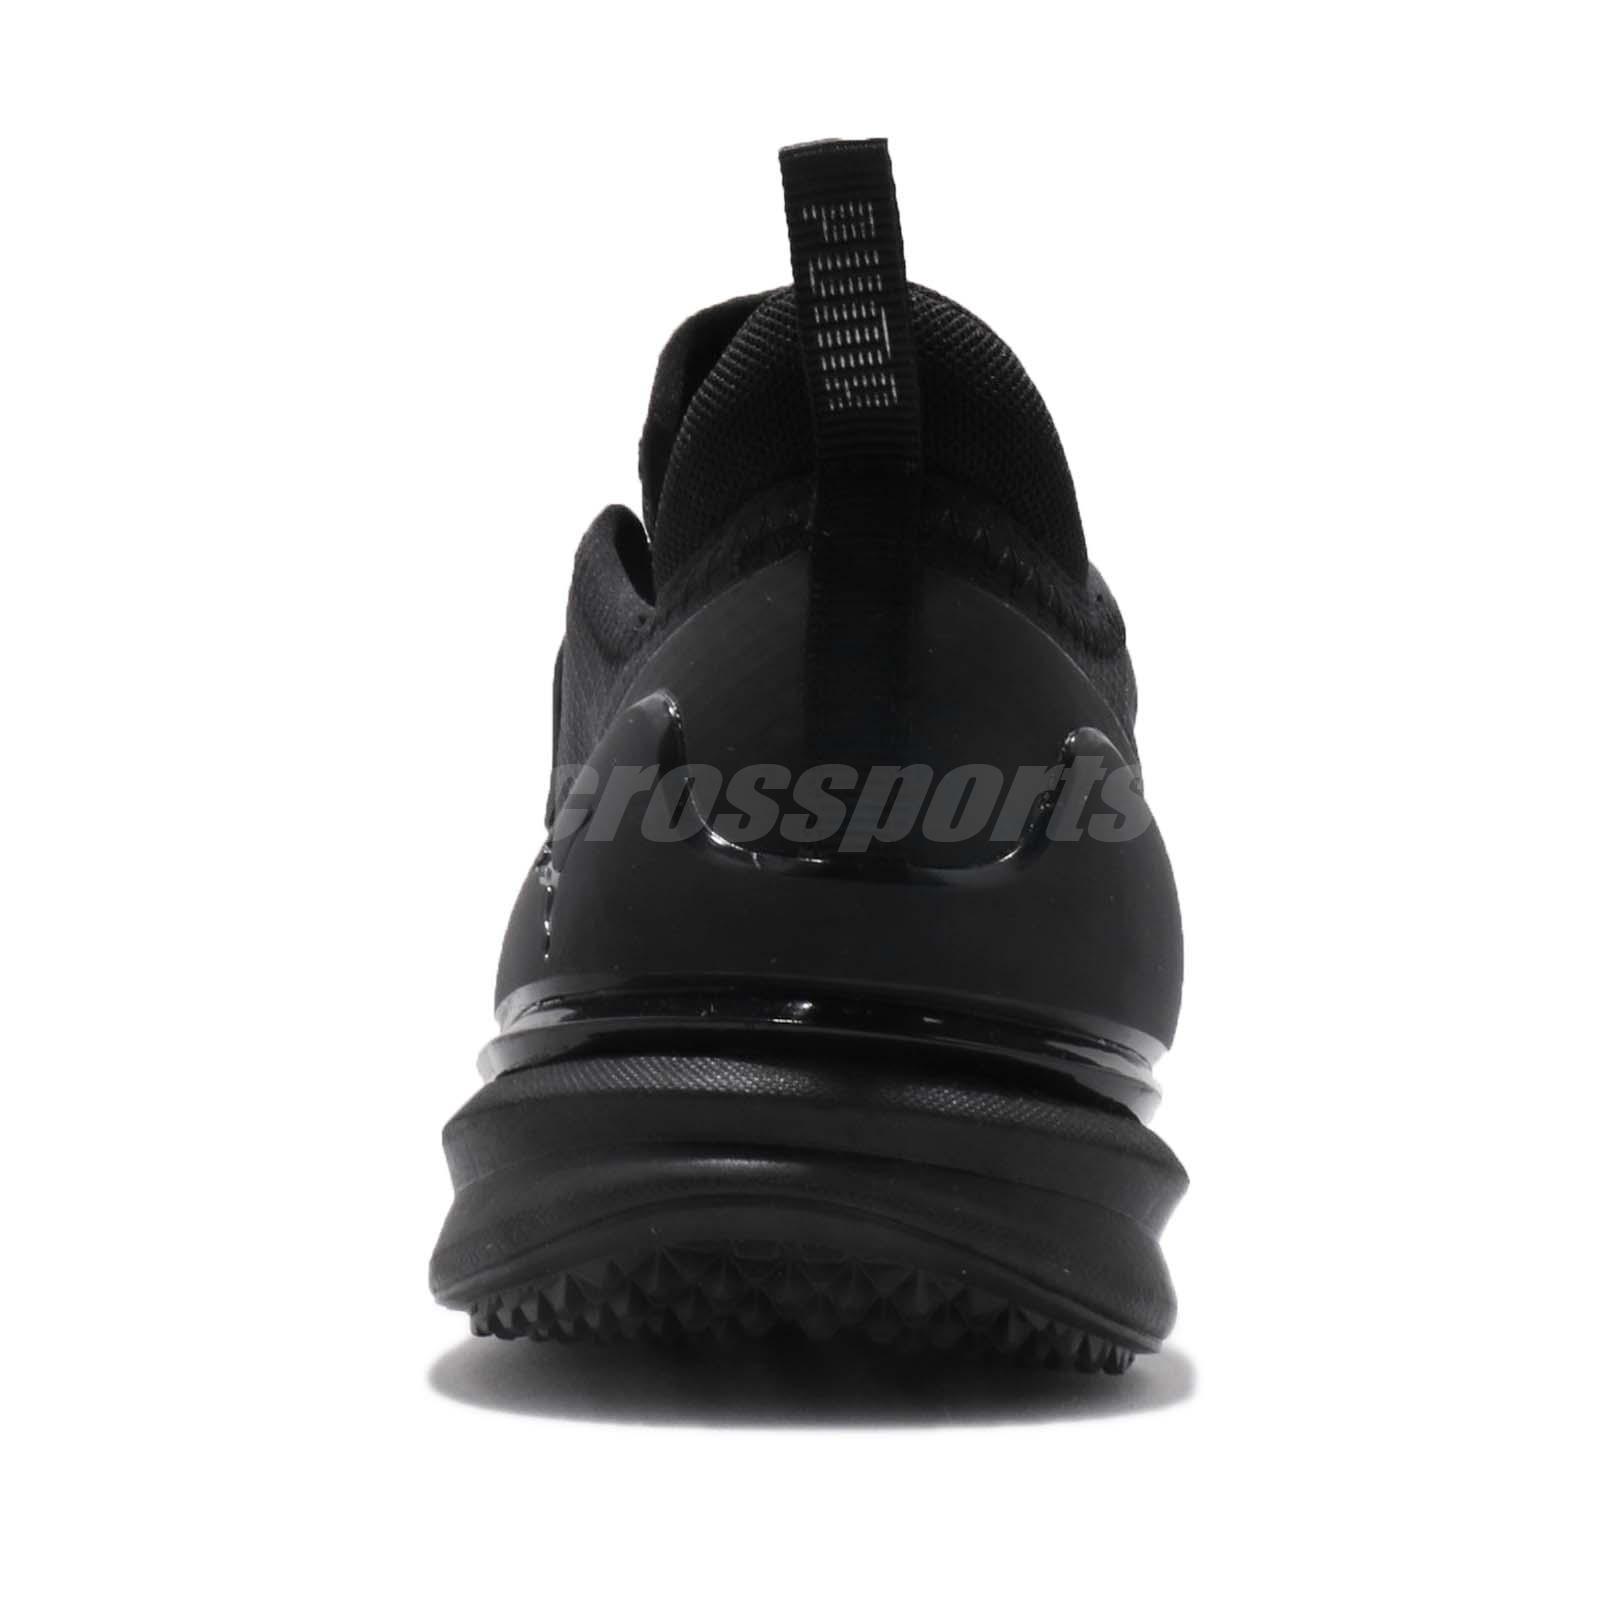 03922c2b206 Puma Ignite Limitless Initiate Black Men Running Training Shoe ...